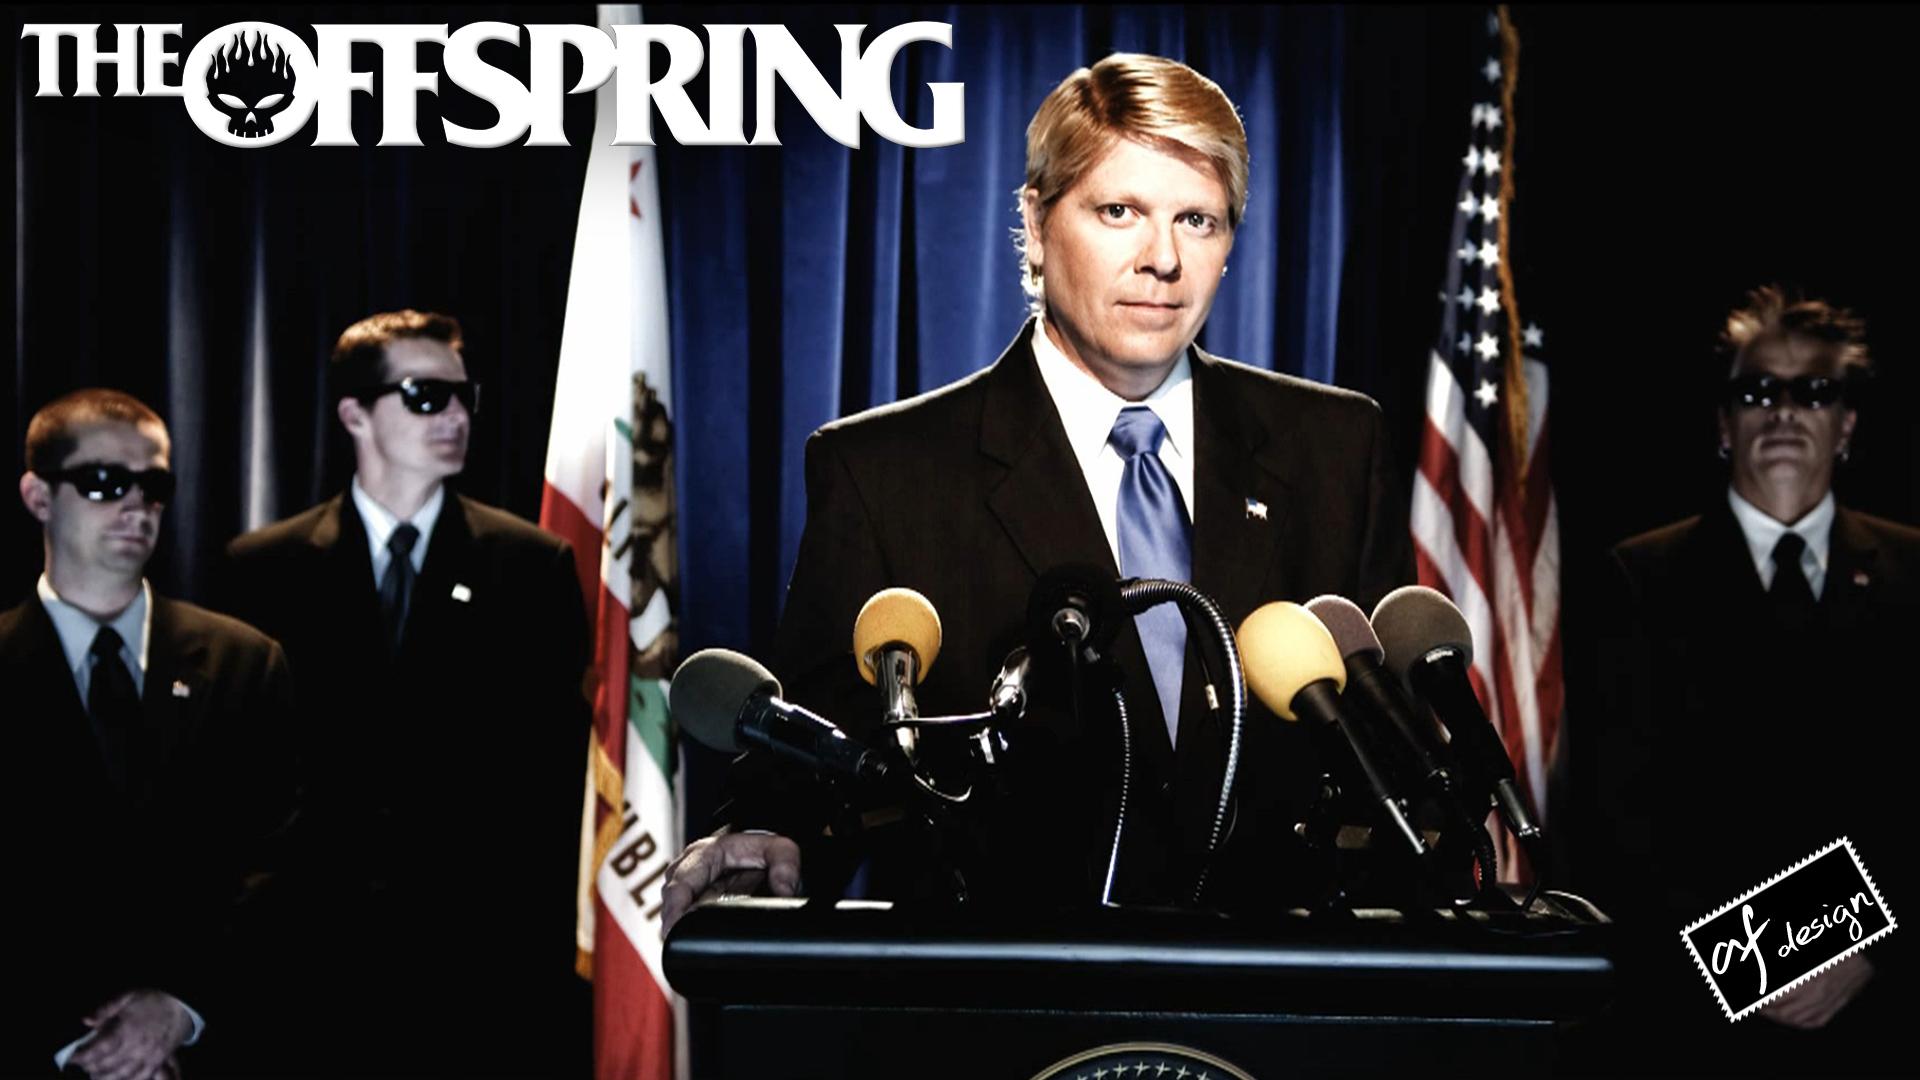 The Offspring Smash Wallpaper